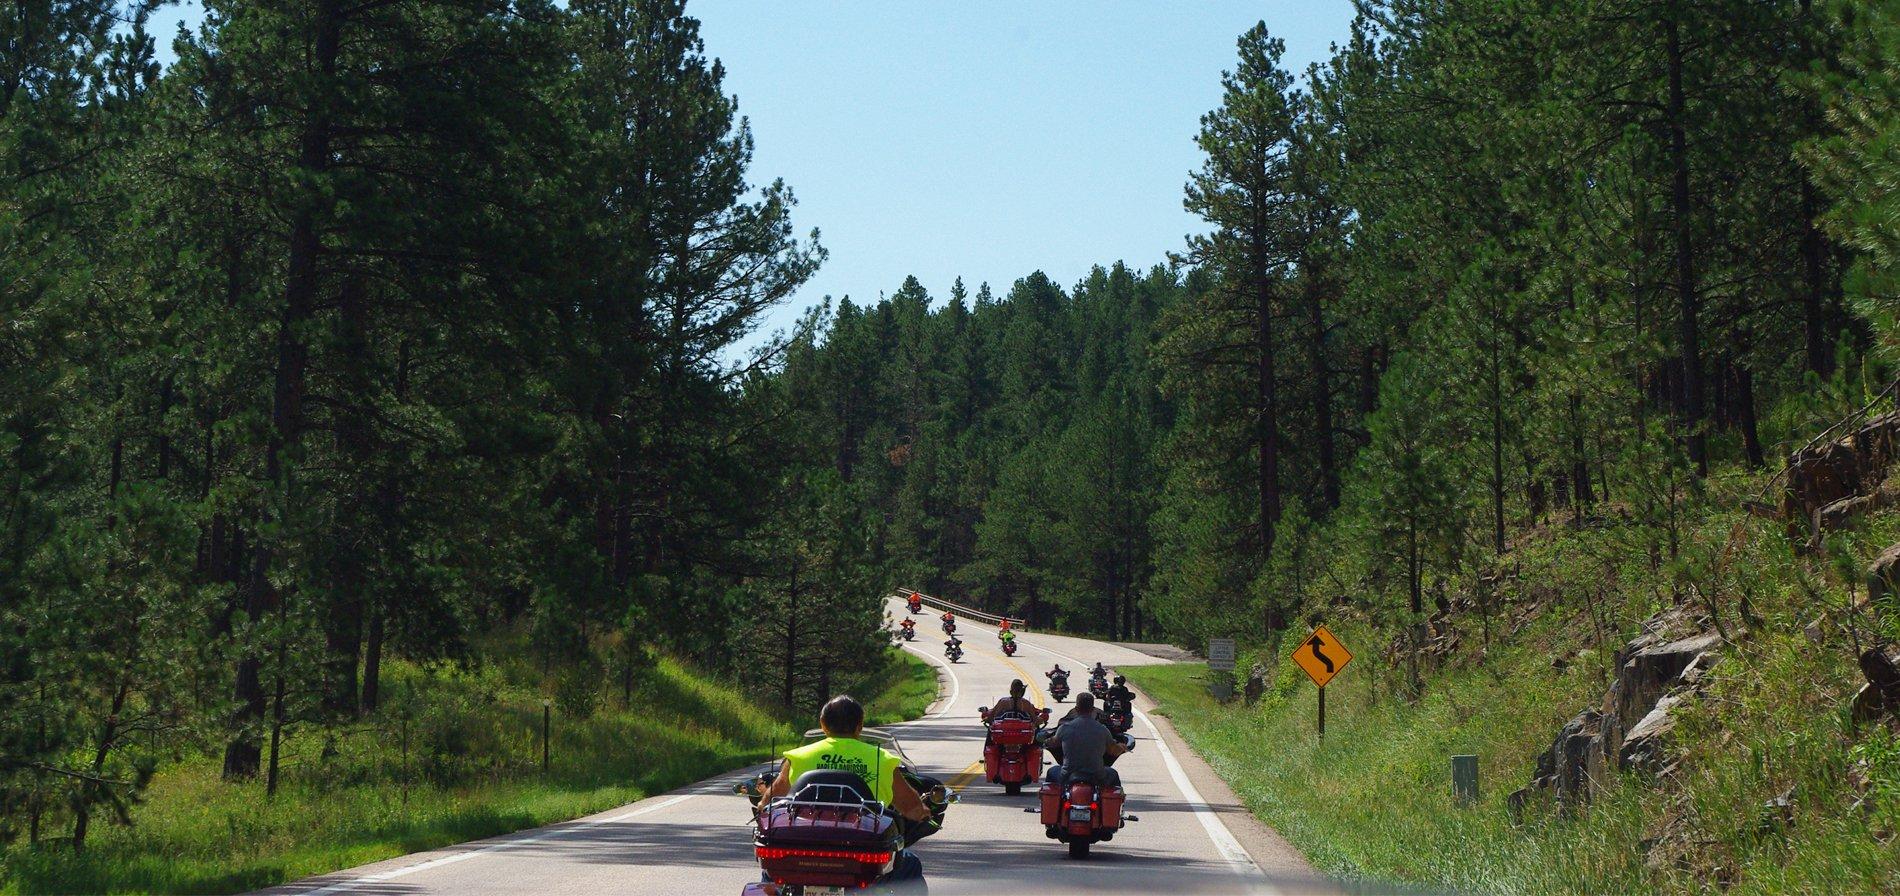 Hog Heaven Campground | Sturgis South Dakota